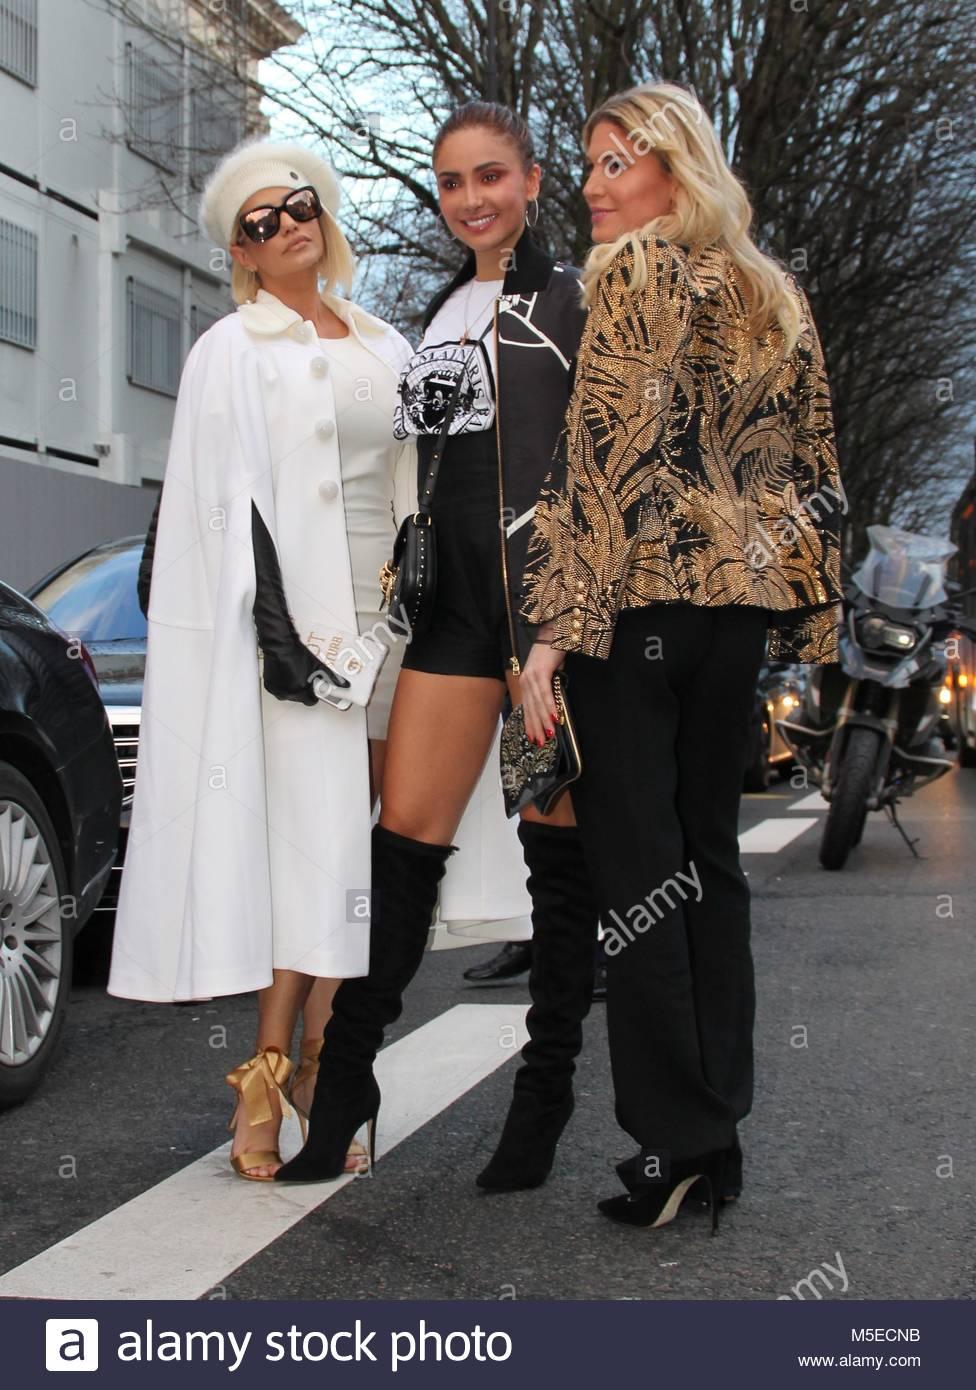 Paris Fashion Week Haute Couture - Ralph & Russo show - Arrivals  Featuring: Hofit Golan, Gloria Patricia Contreras - Stock Image